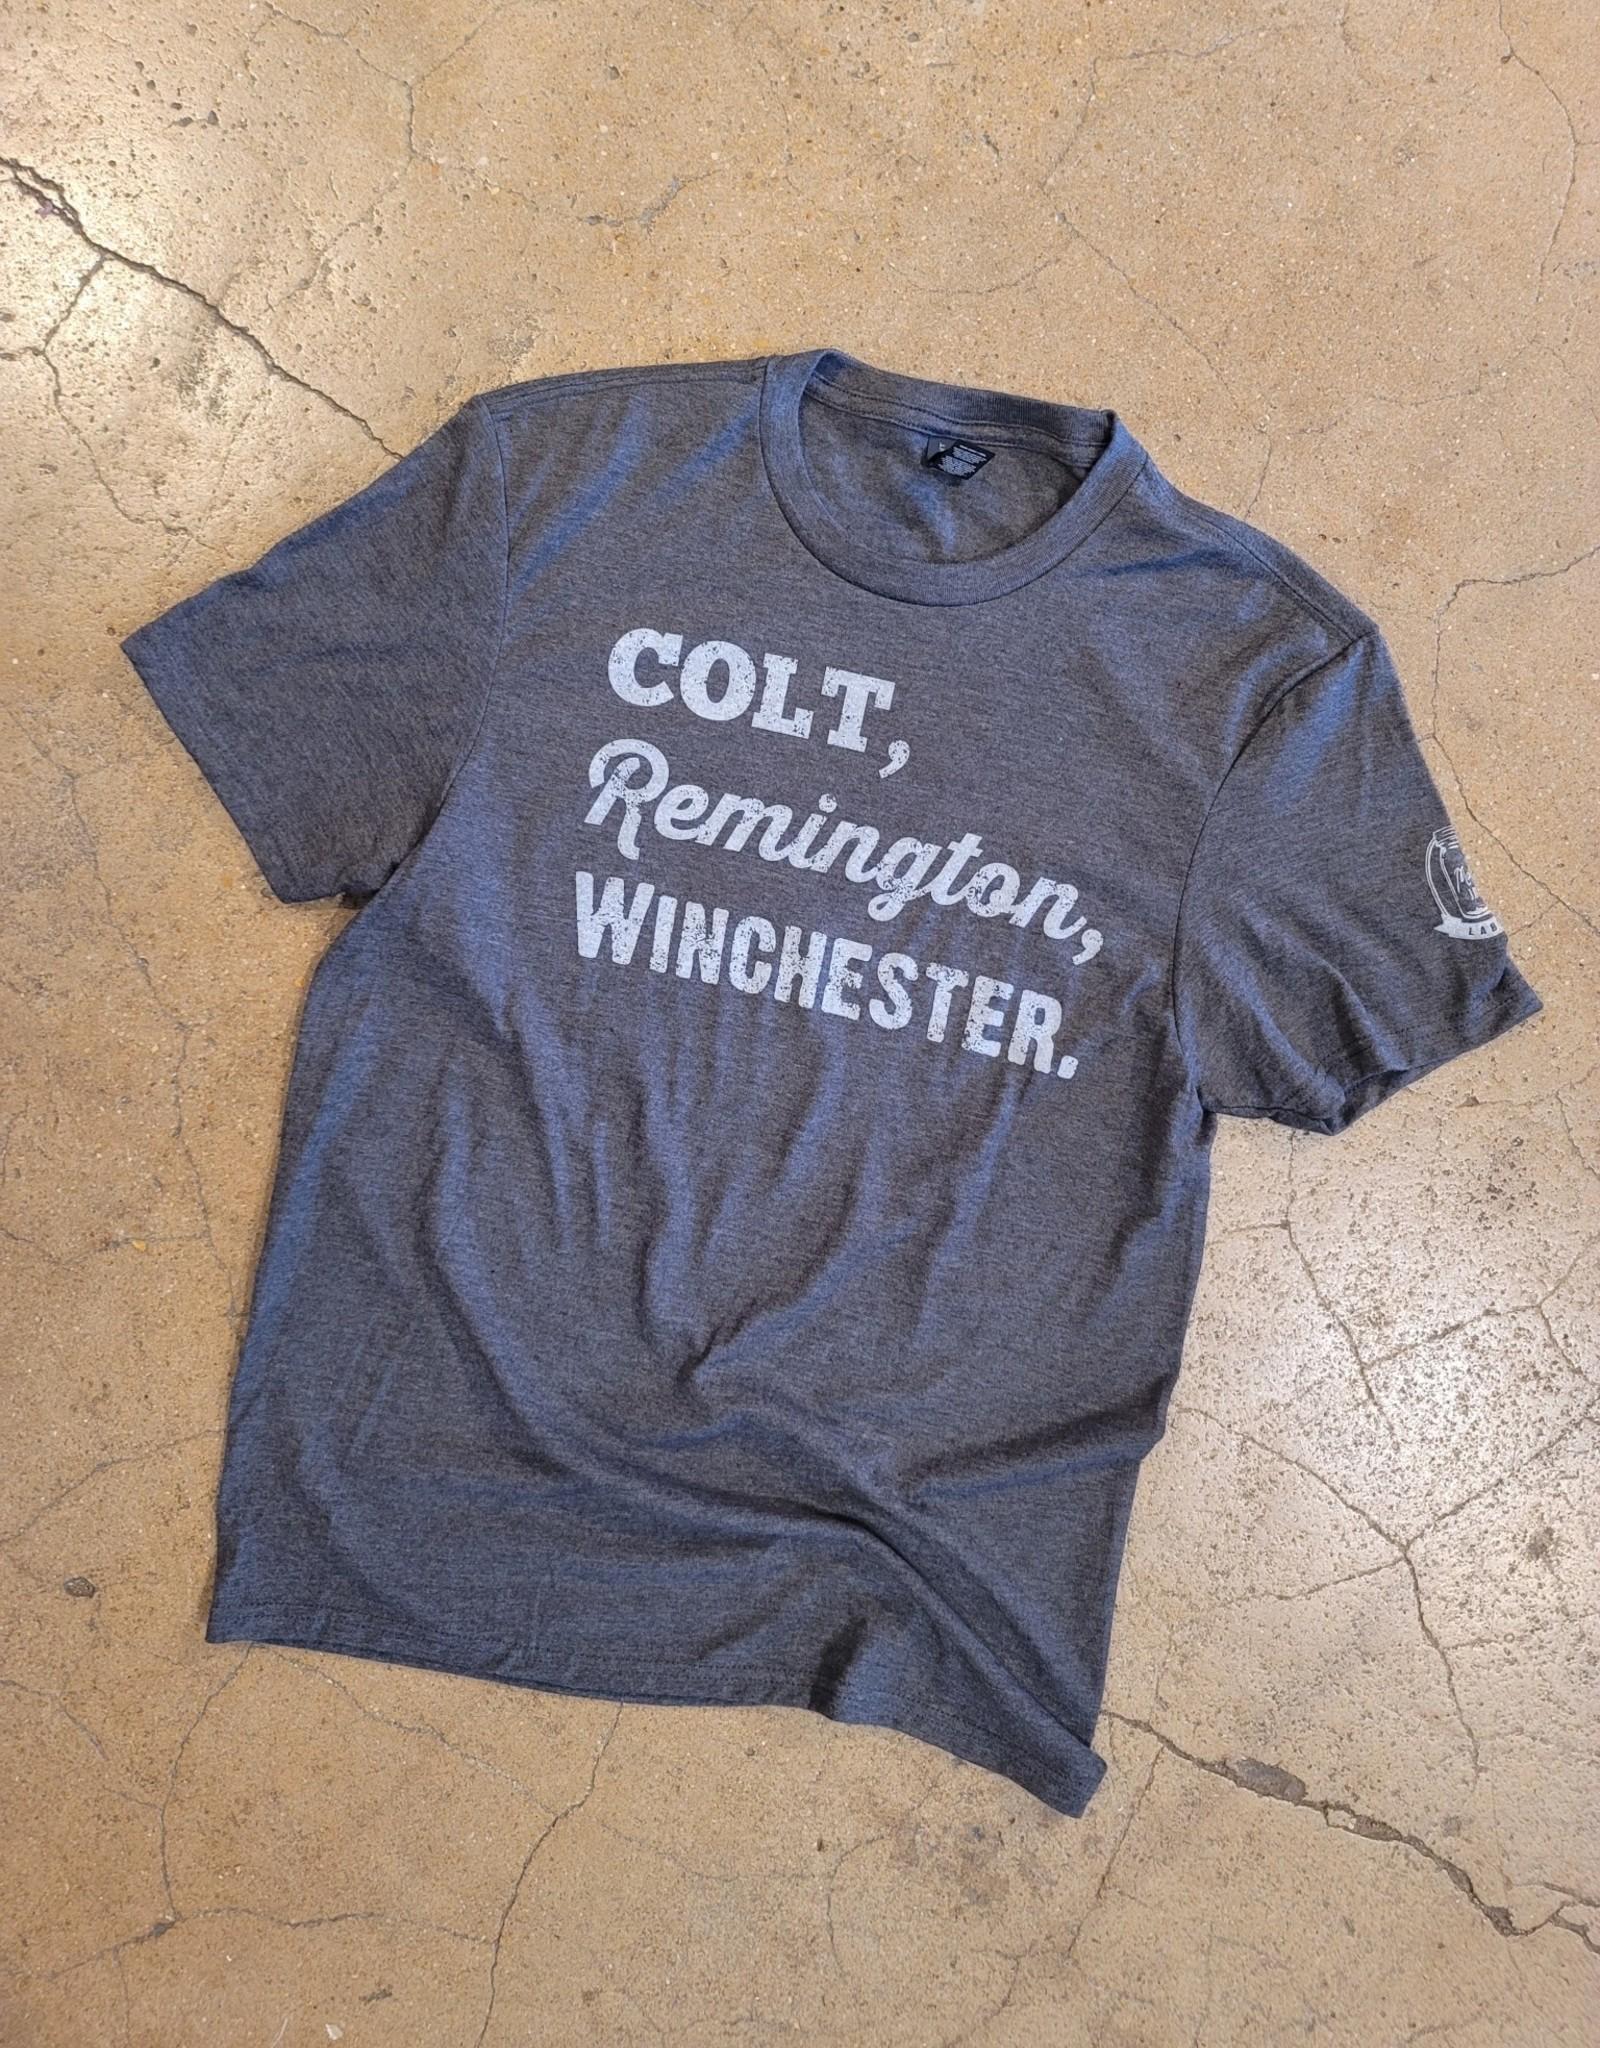 Colt, Remington, Winchester Tee